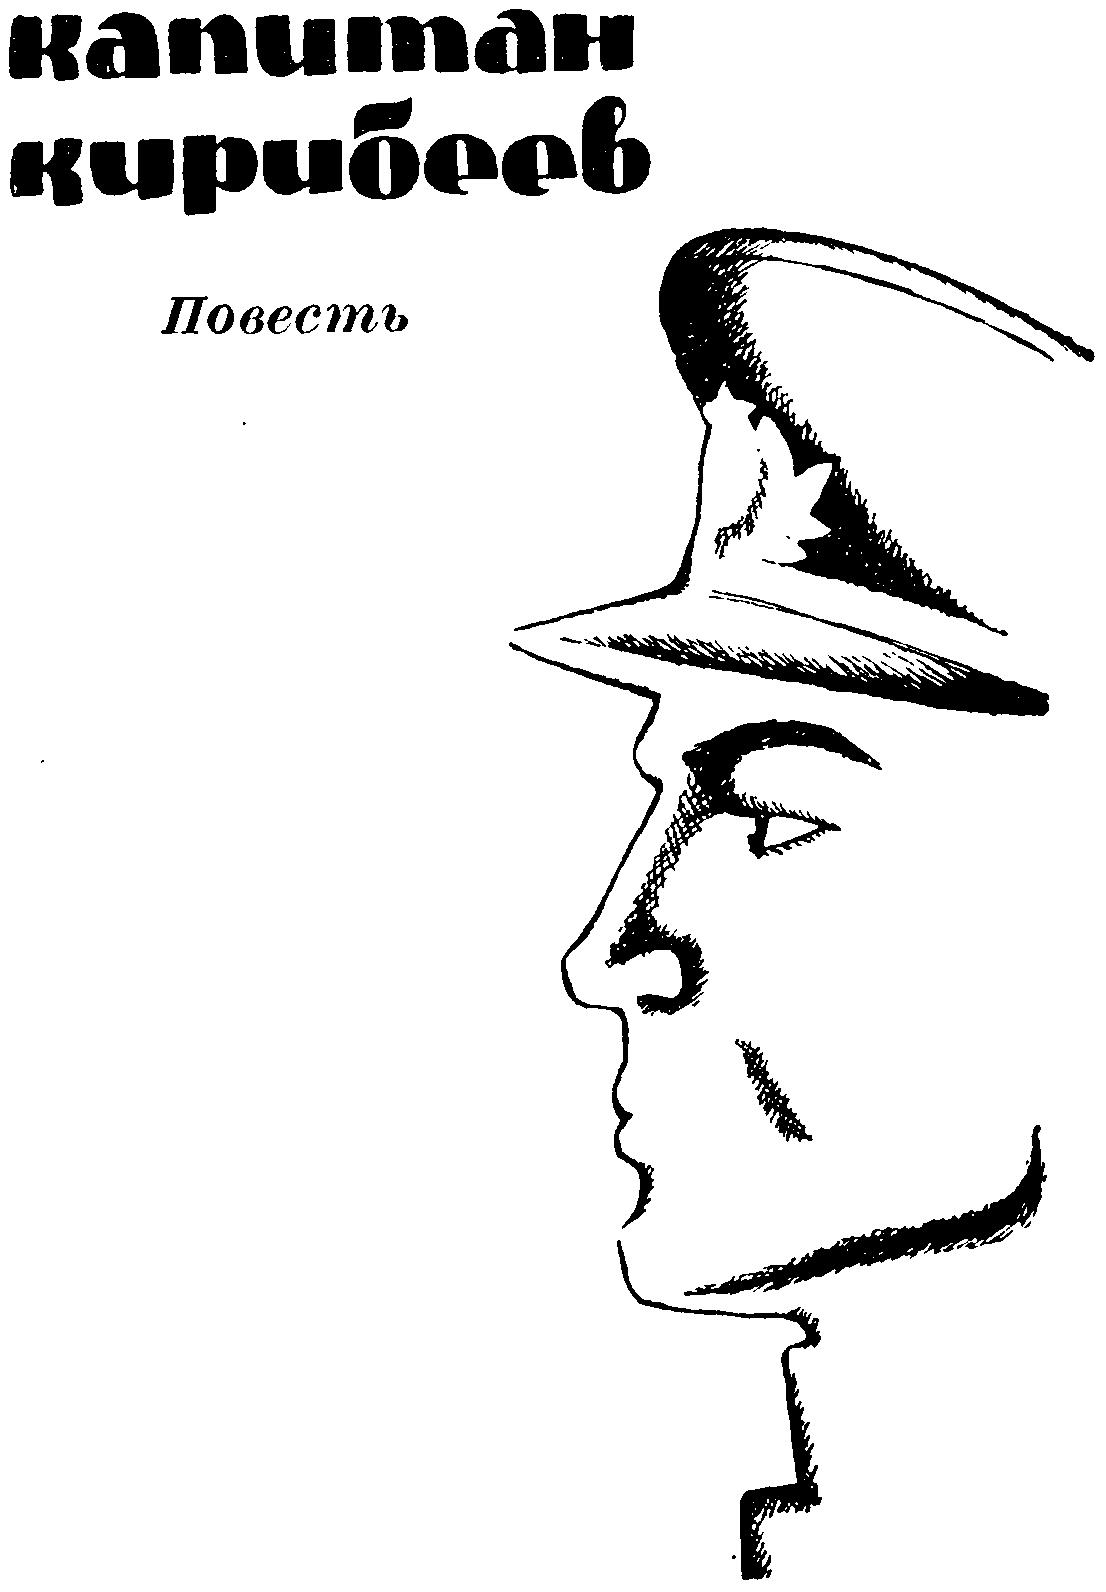 Капитан Кирибеев. Трамонтана. Сирень